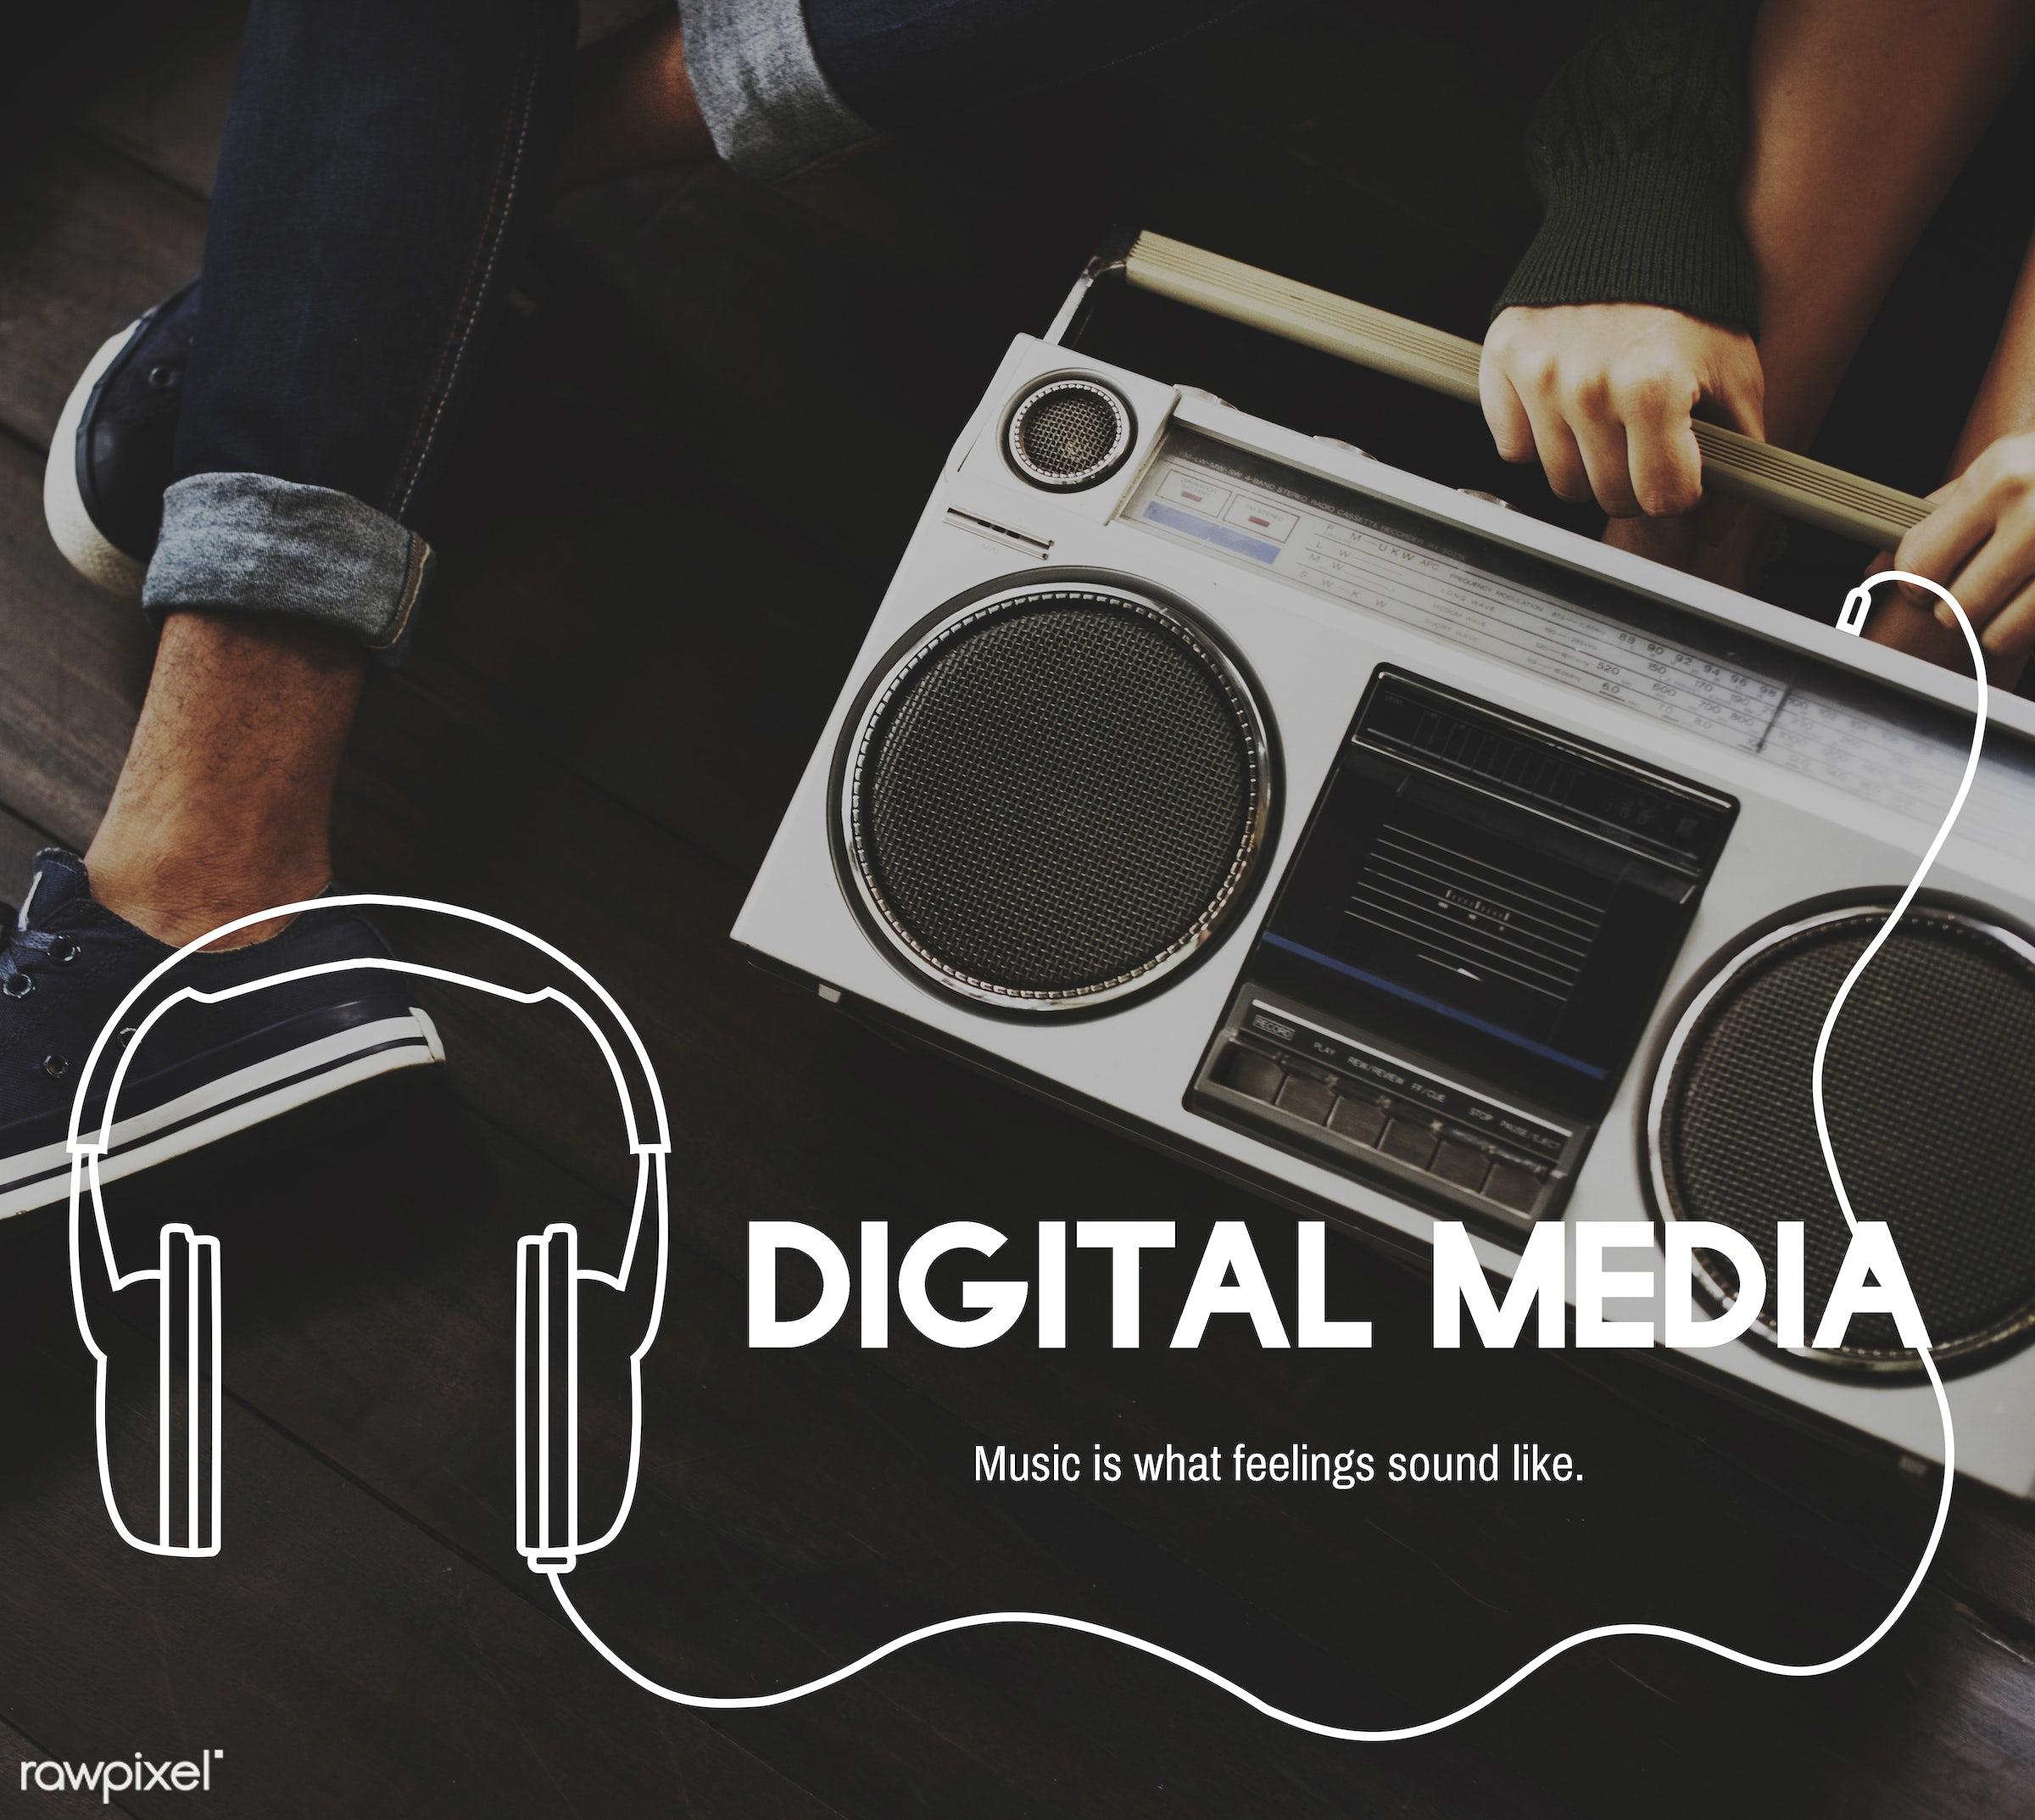 audio, broadcast, chilling, digital media, enjoyment, entertain, entertainment, fun, graphic, headphone, leisure, lifestyle...